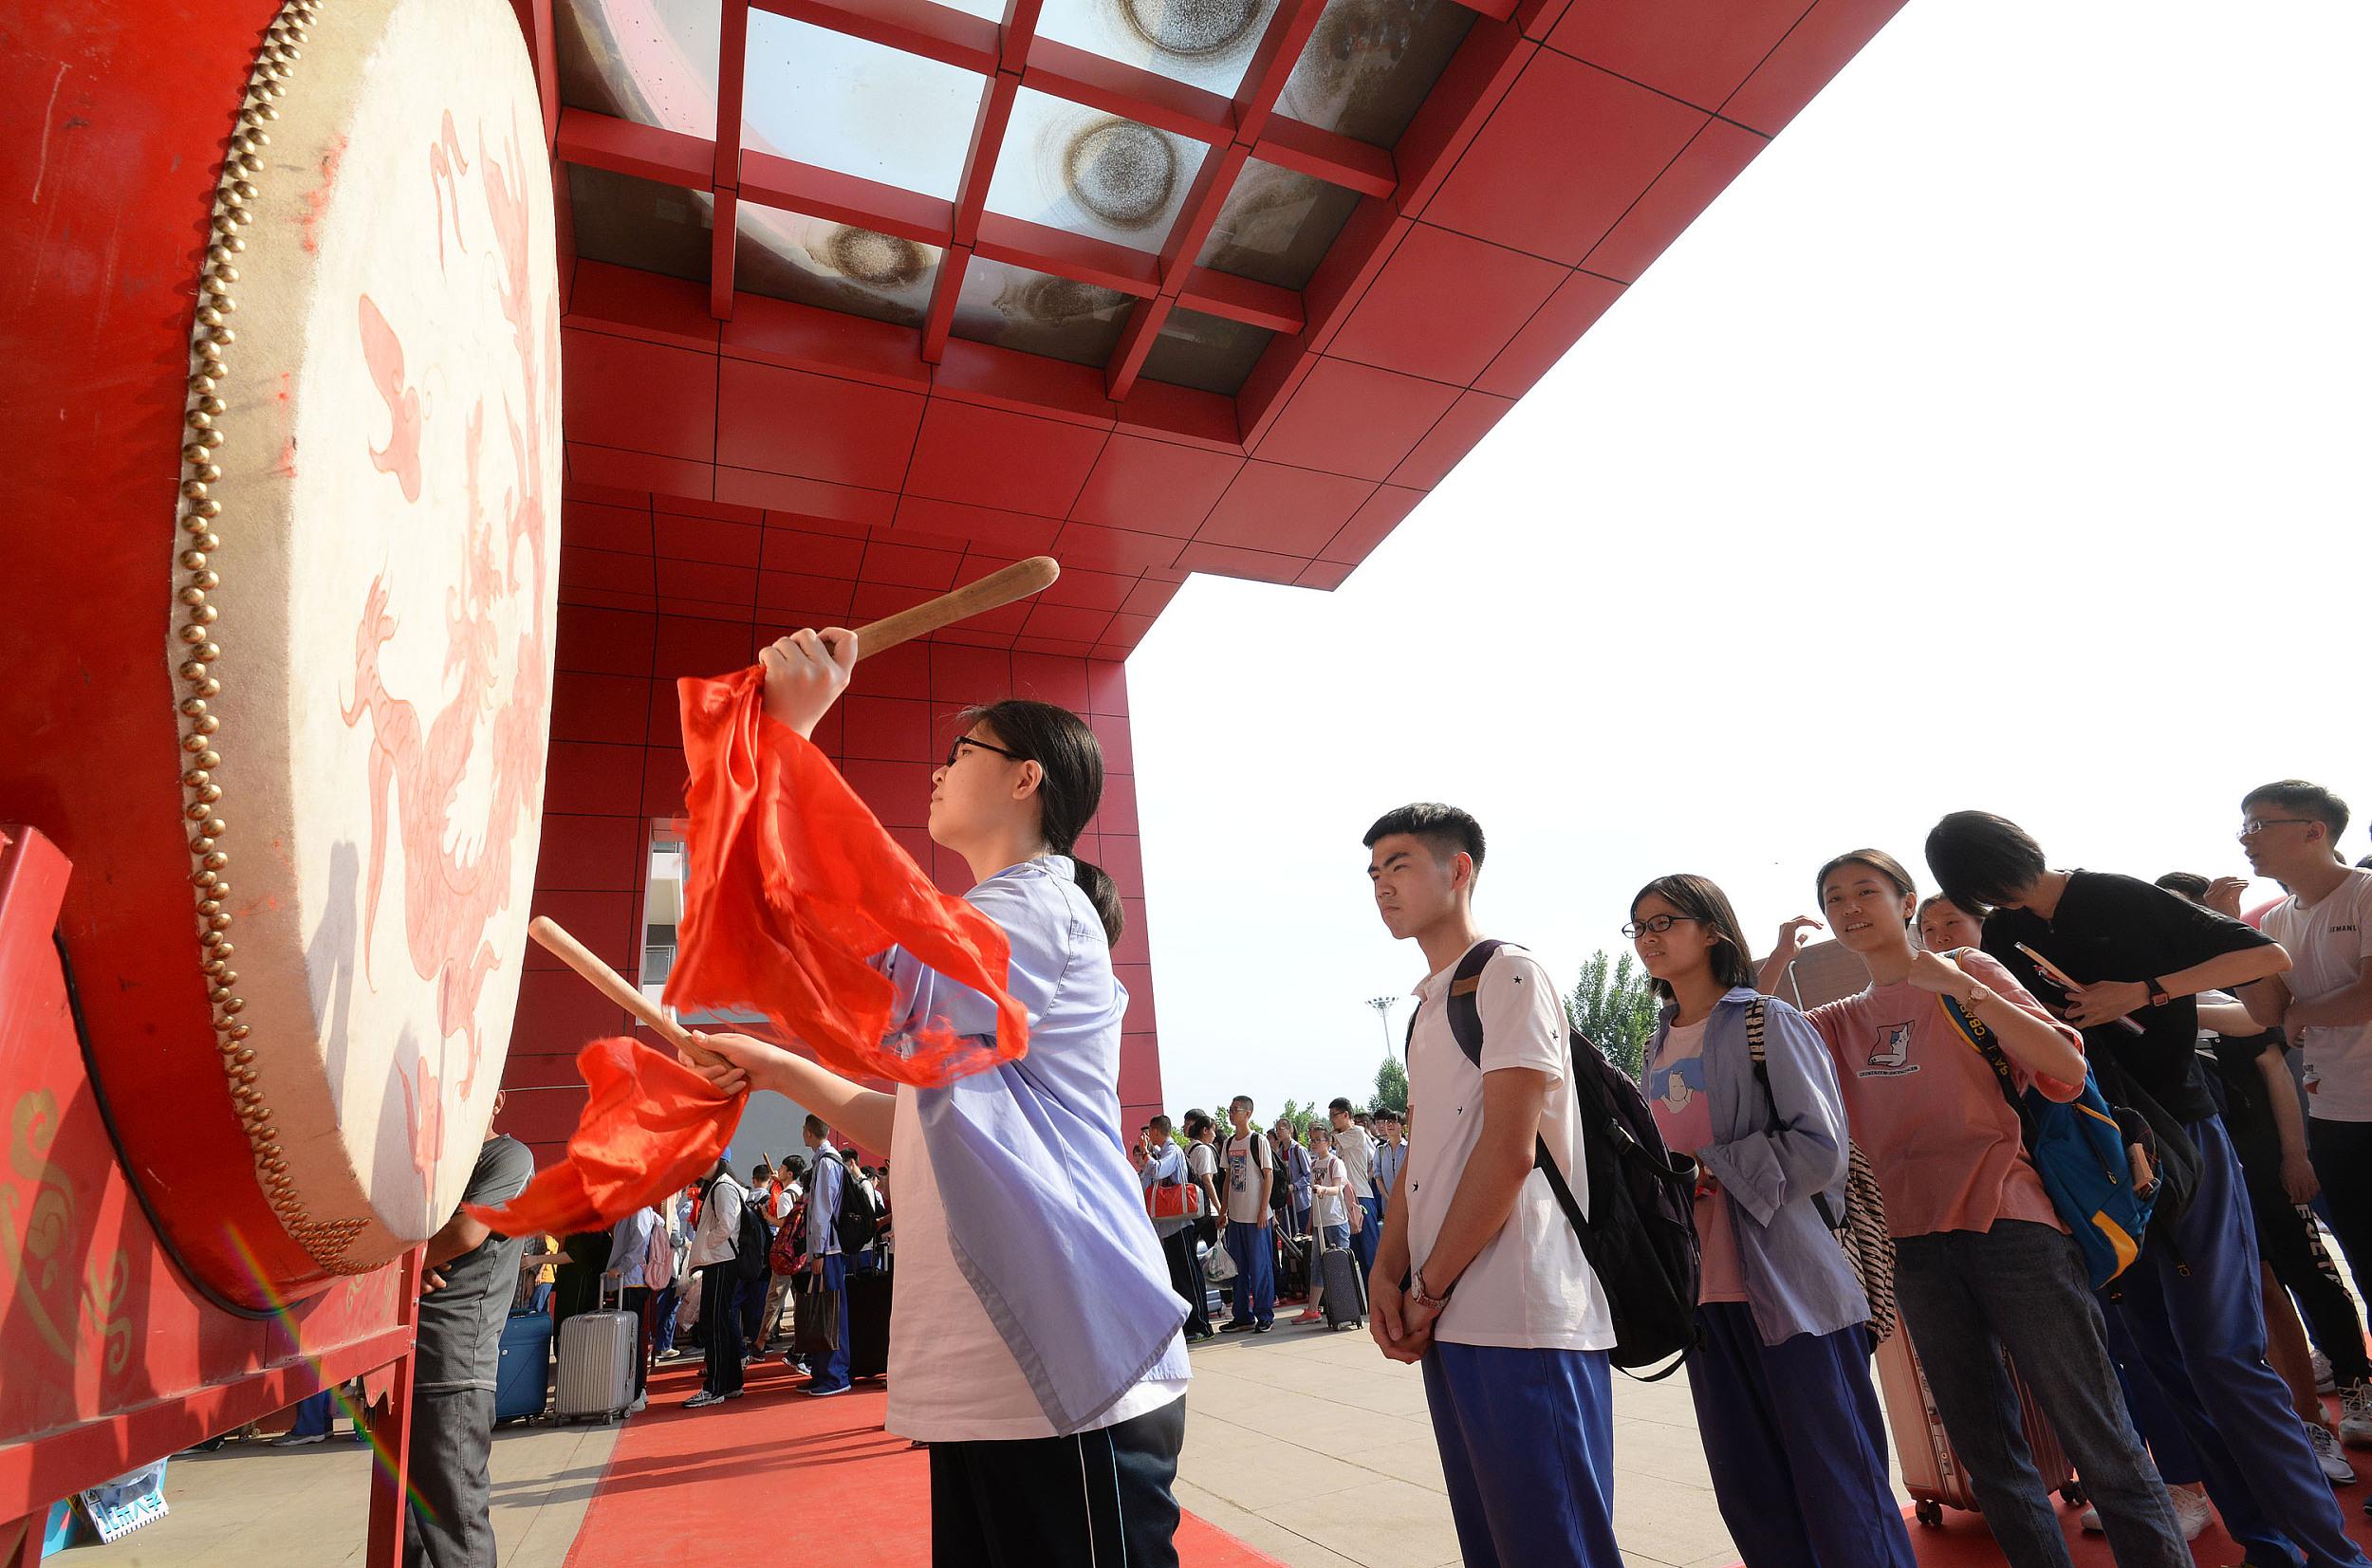 365bet体育在线河北邯郸:擂战鼓冲高考 校园举办励志活动为学